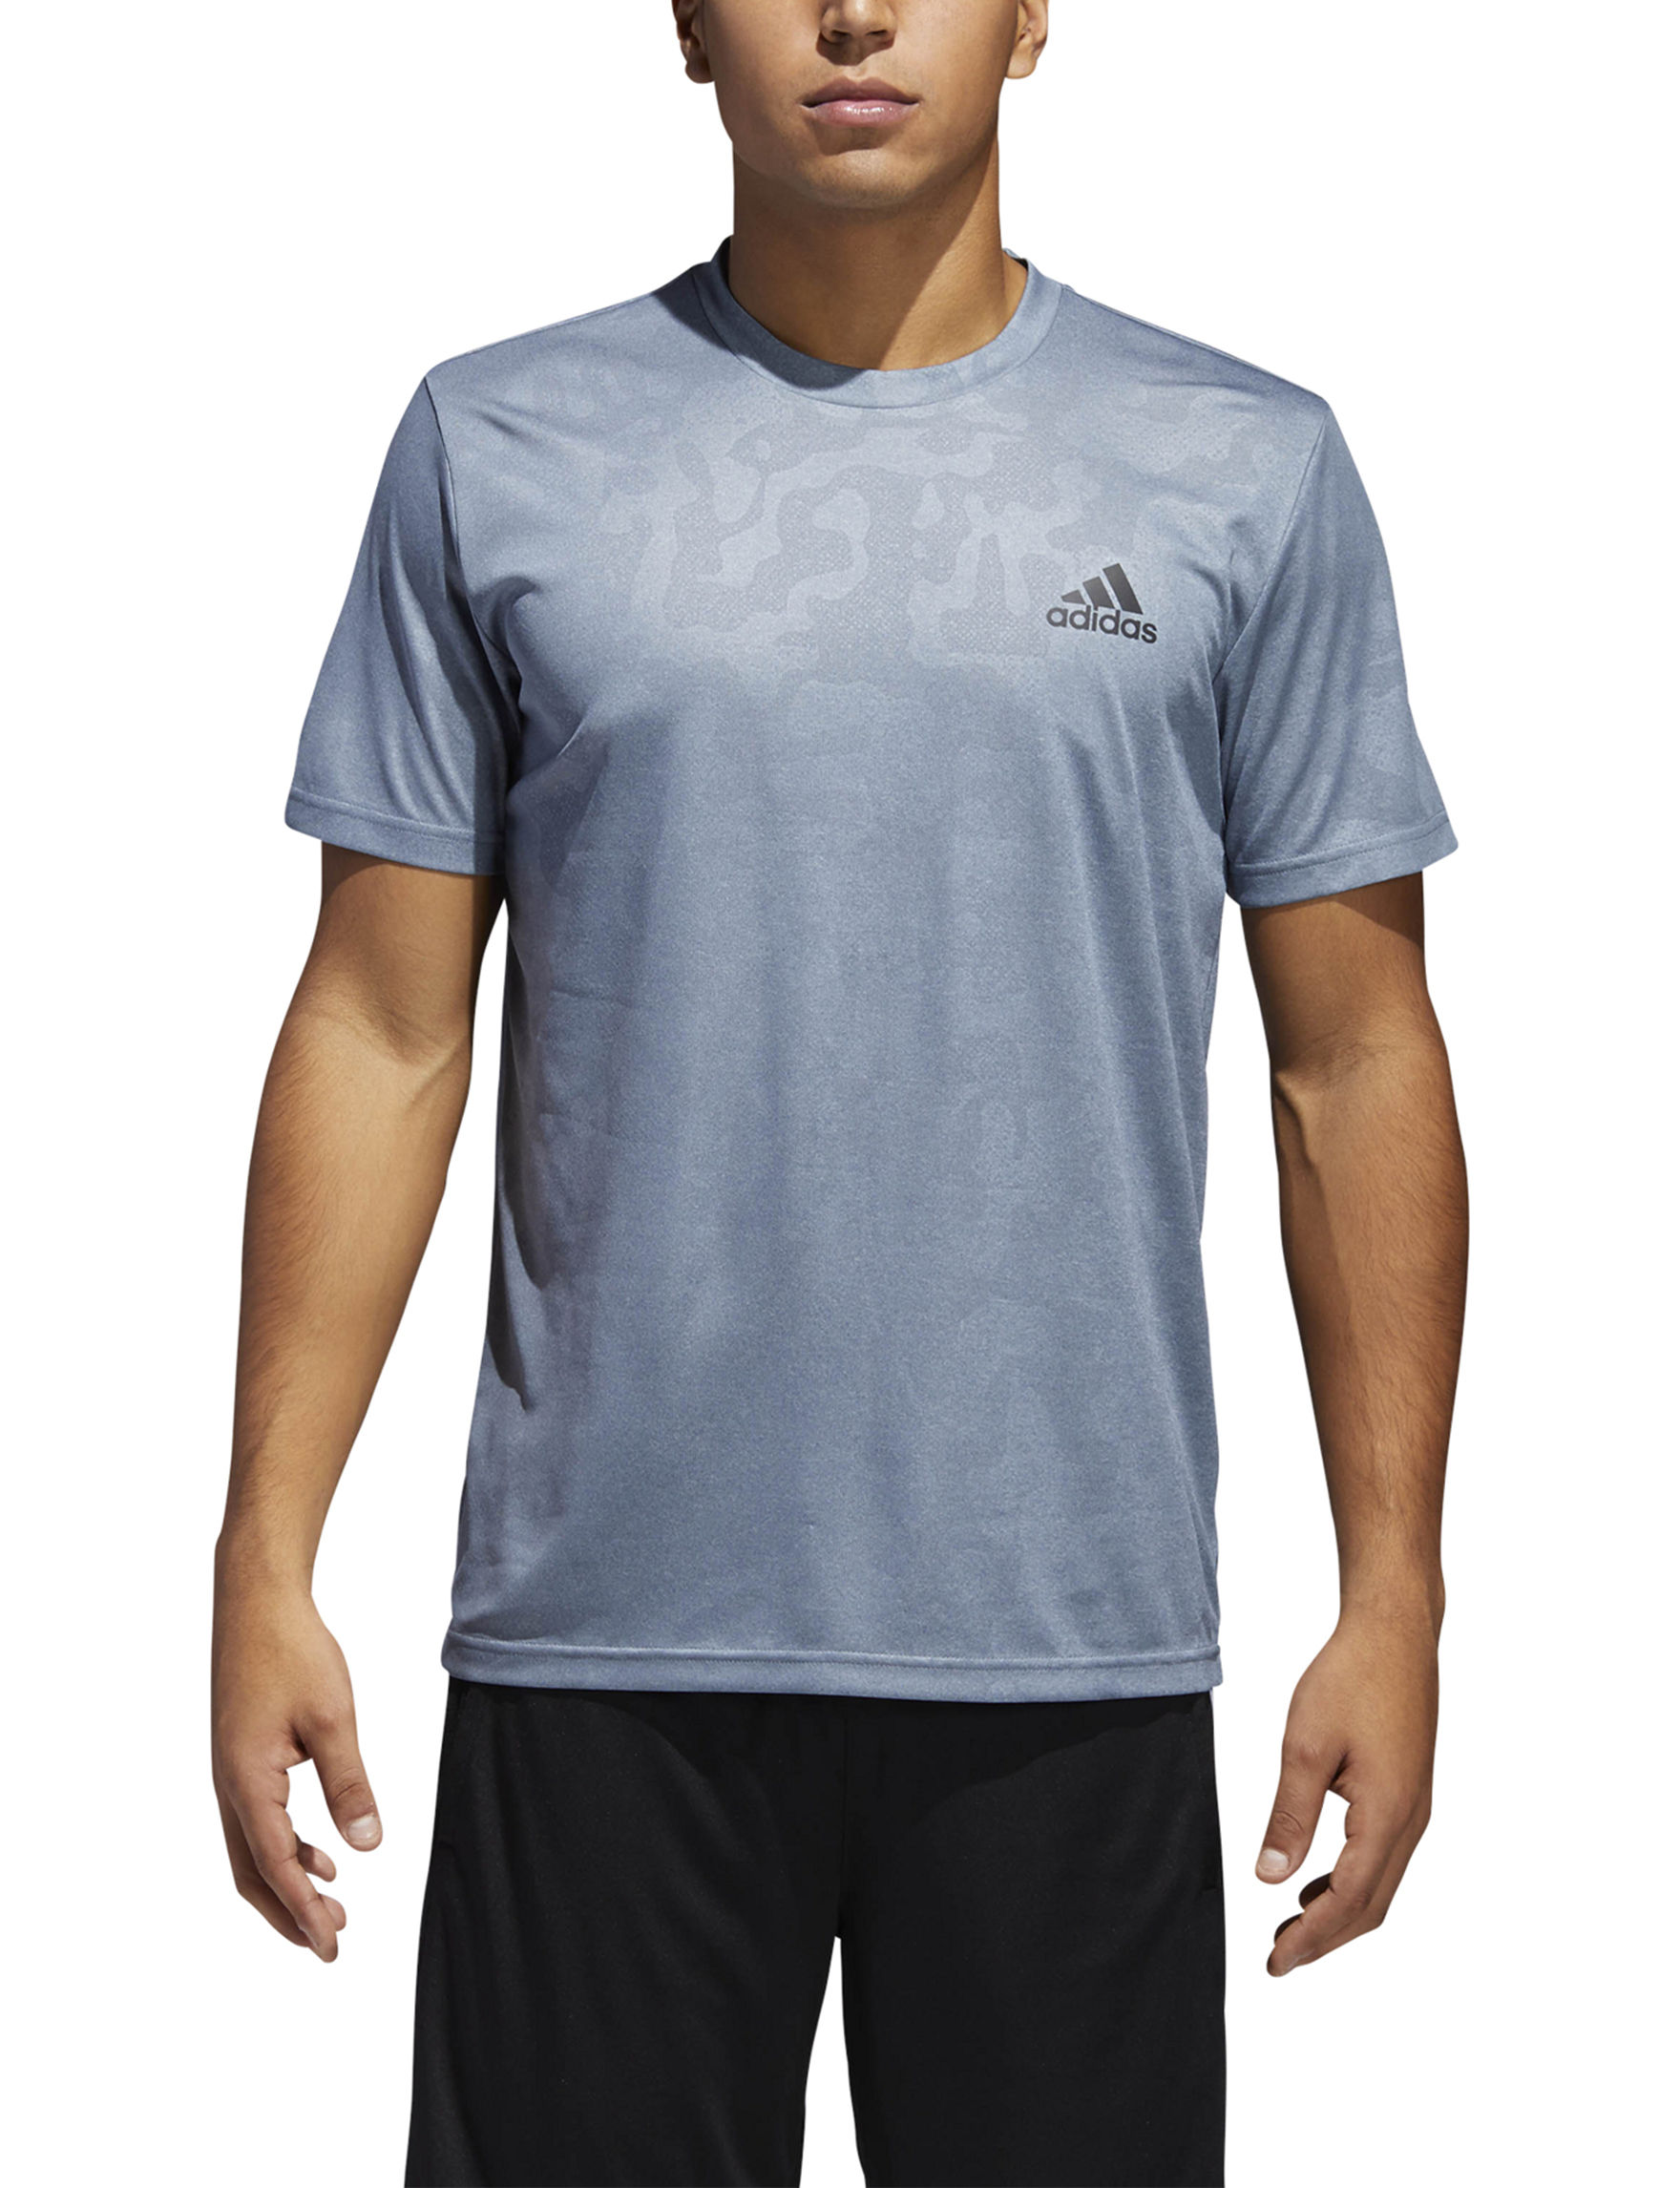 Adidas Steel Blue